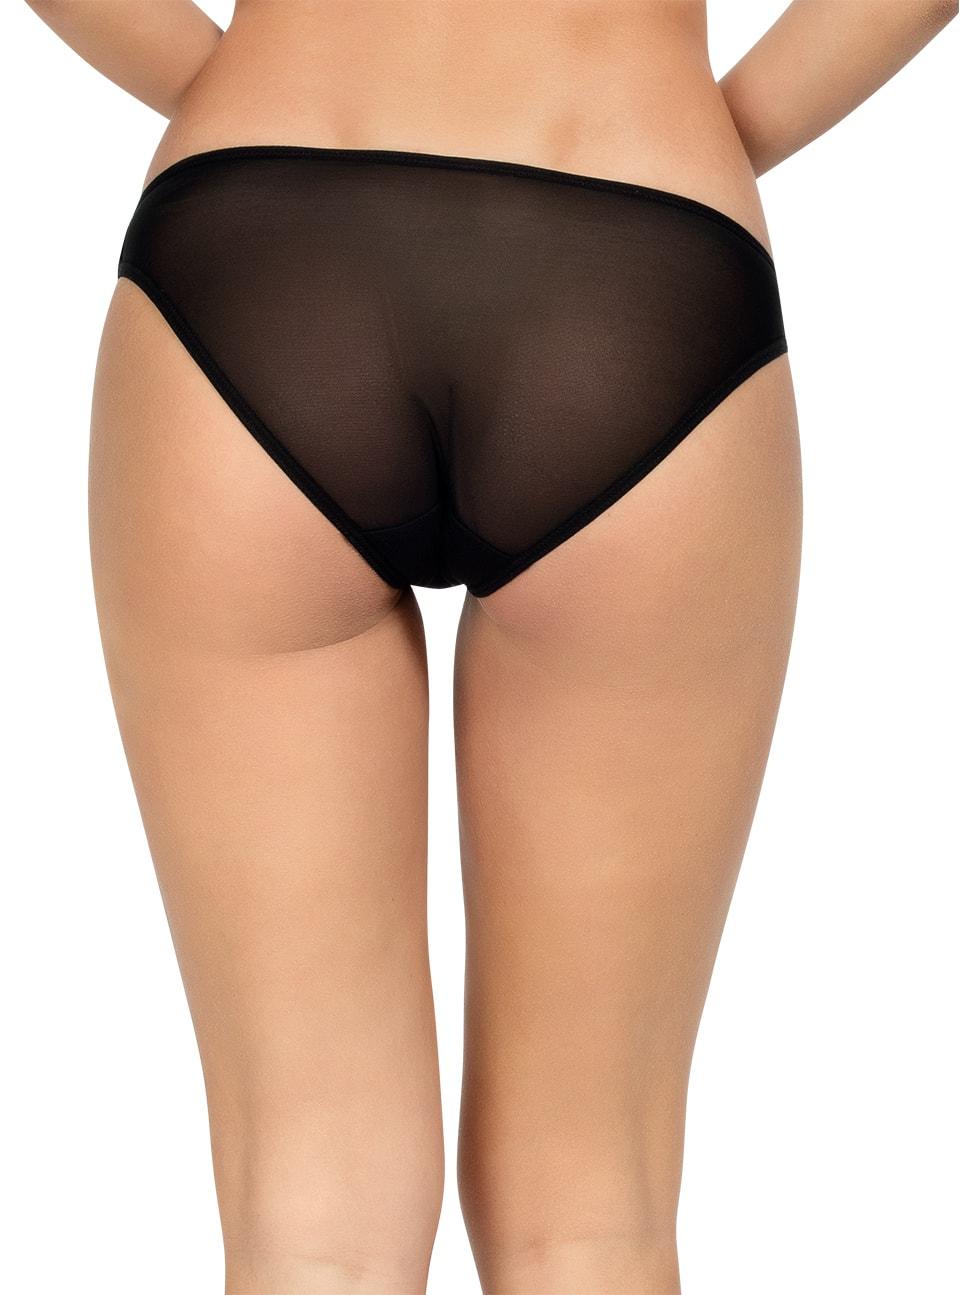 Amour Bikini - Black - A1473